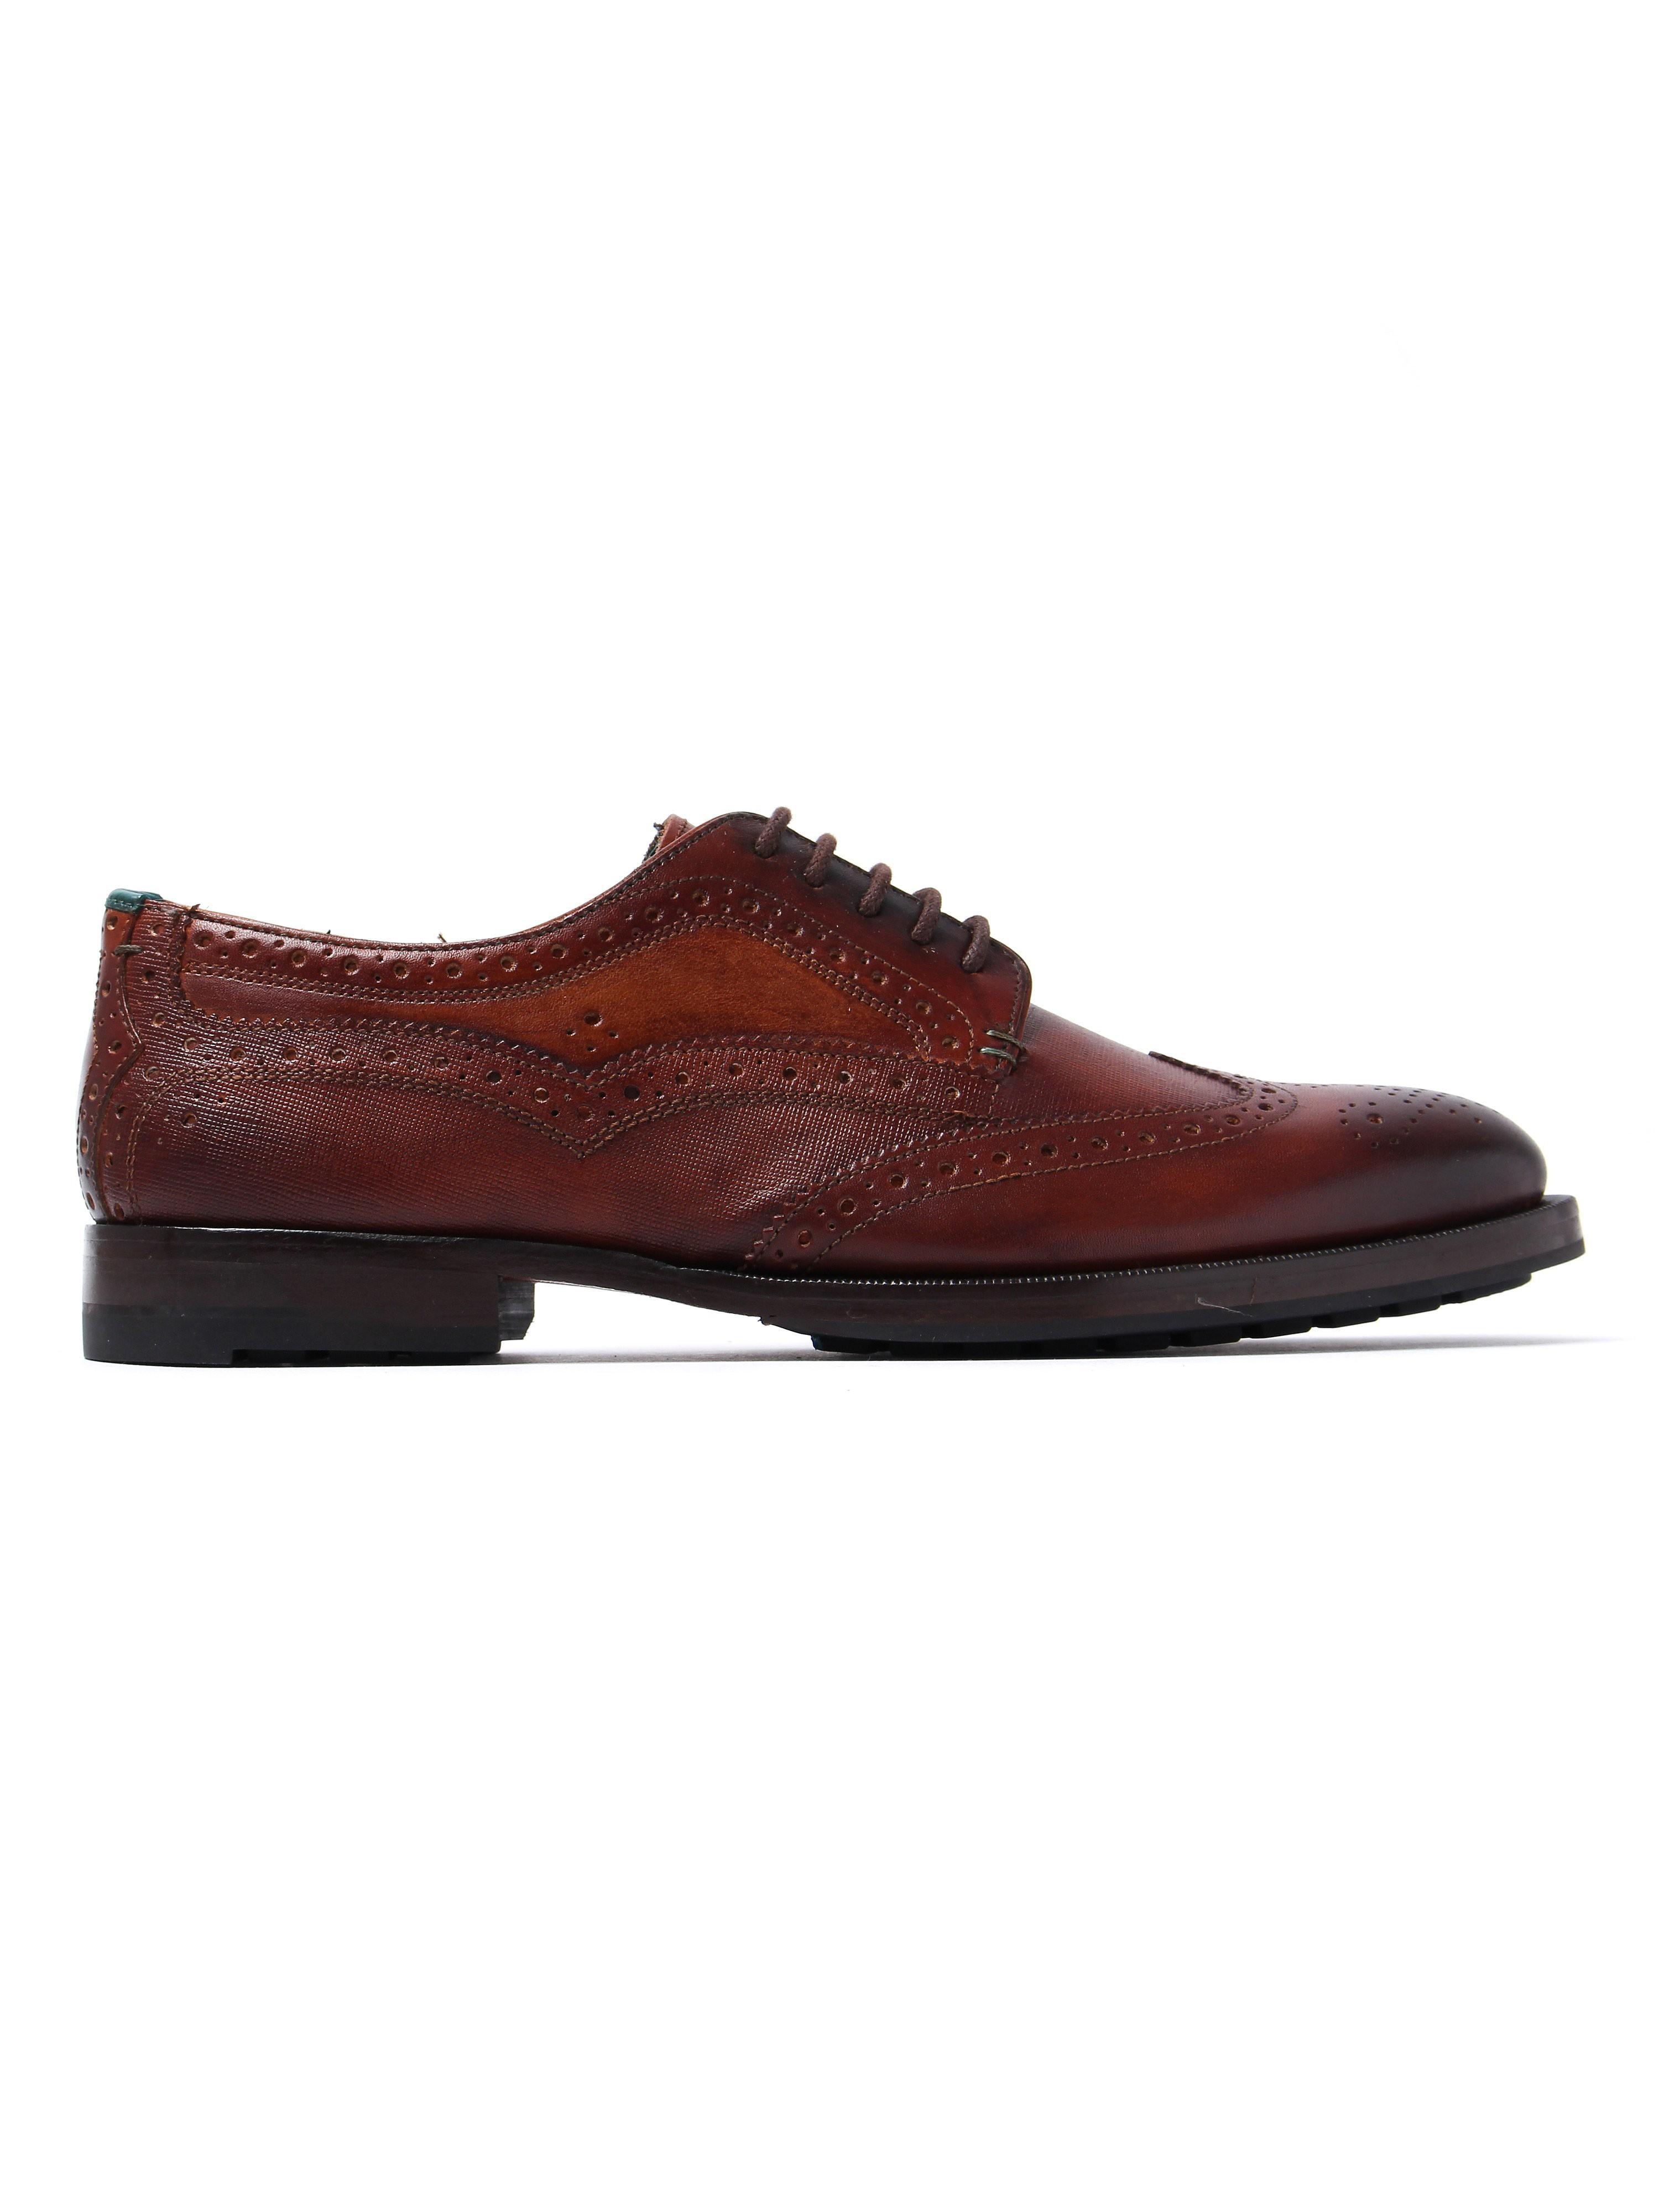 Ted Baker Men's Senape Oxford Brogues - Tan Leather